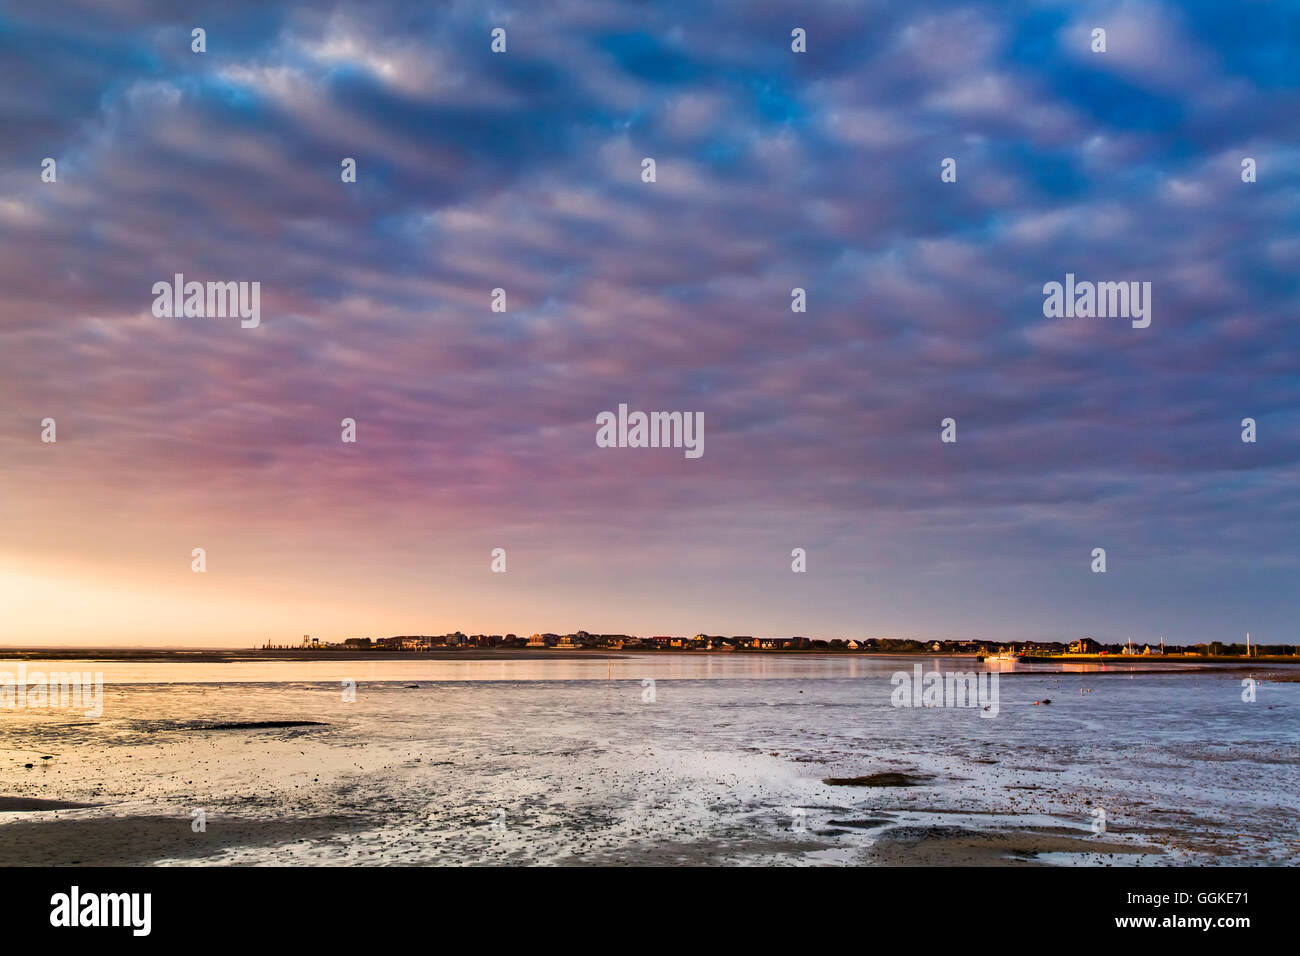 Sunrise over the wadden sea, Amrum Island, North Frisian Islands, Schleswig-Holstein, Germany - Stock Image